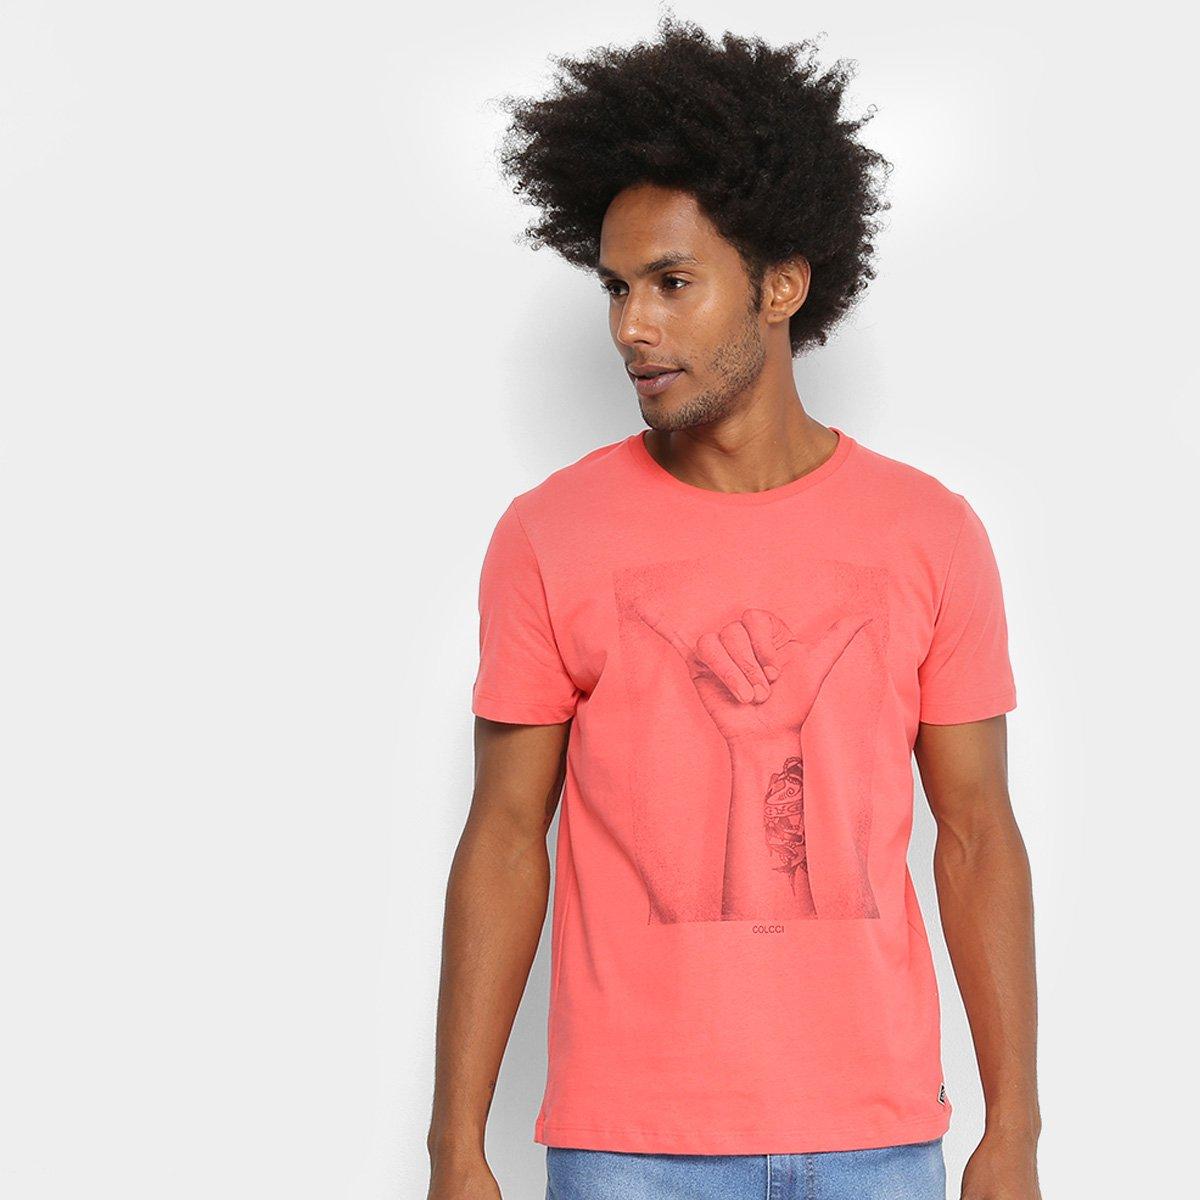 Camiseta Colcci Hangloose Masculina 490cf50aef9